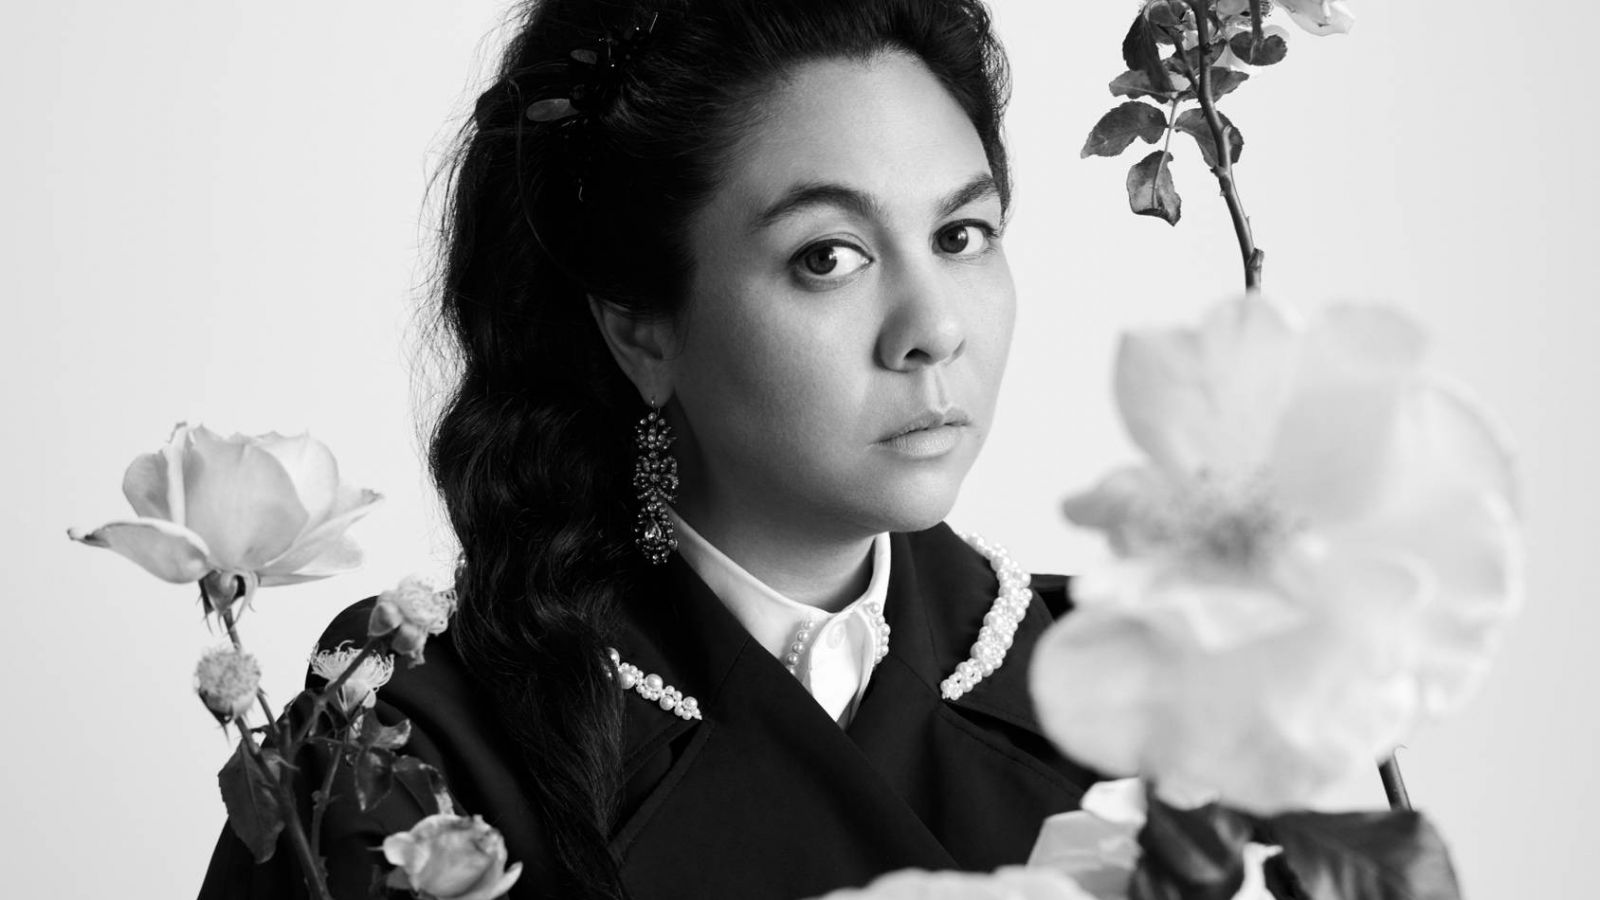 Simone Rocha: Η συνεργασία με την H&M σε μια μοναδική συλλογή προσβάσιμη σε όλους